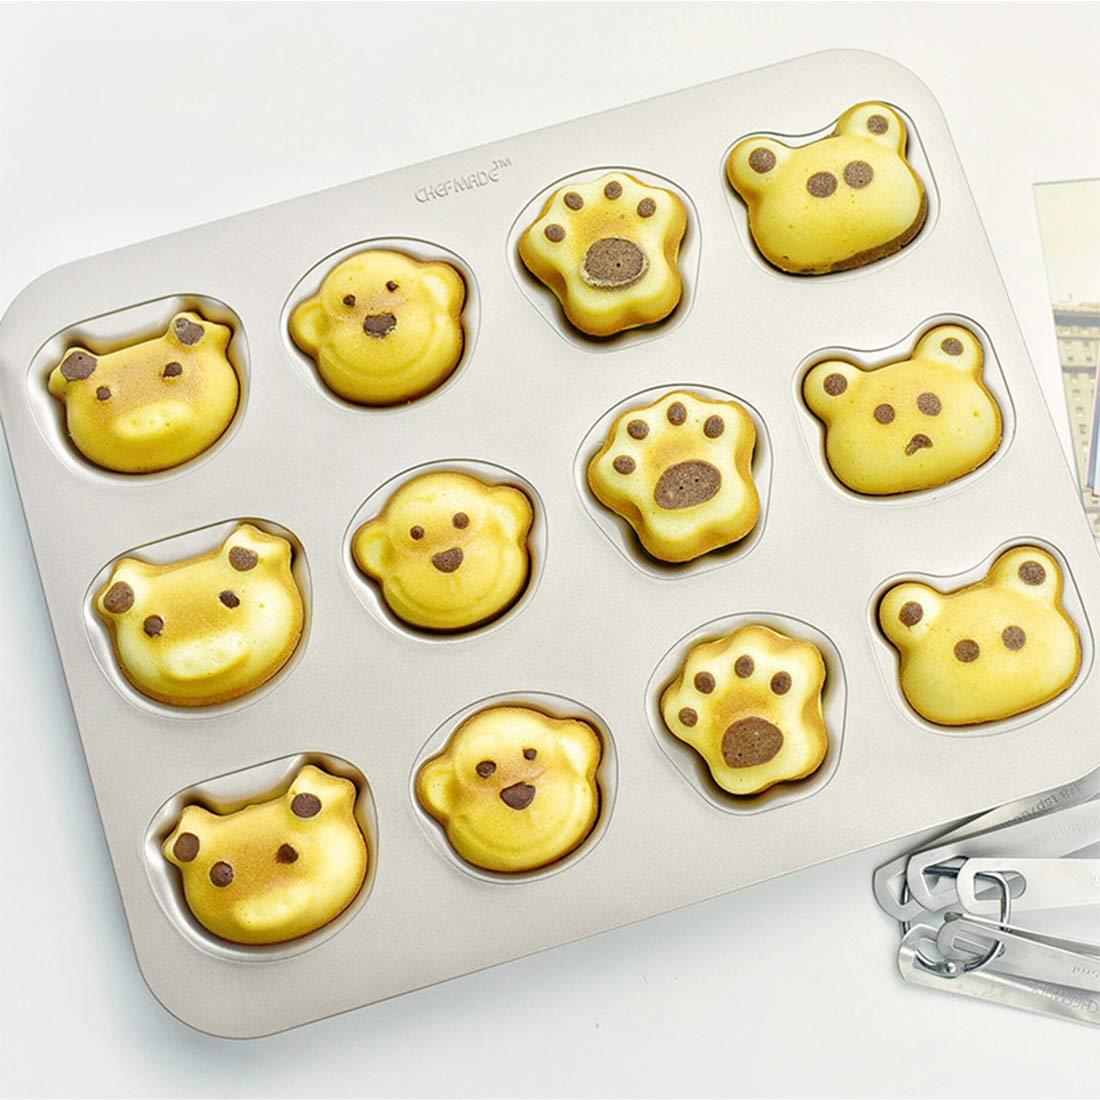 UniM 12 Cavity Financier Madeleine Animal Shaped Baking Pan Nonstick Cake Mold Kitchen Biscuit Bakeware